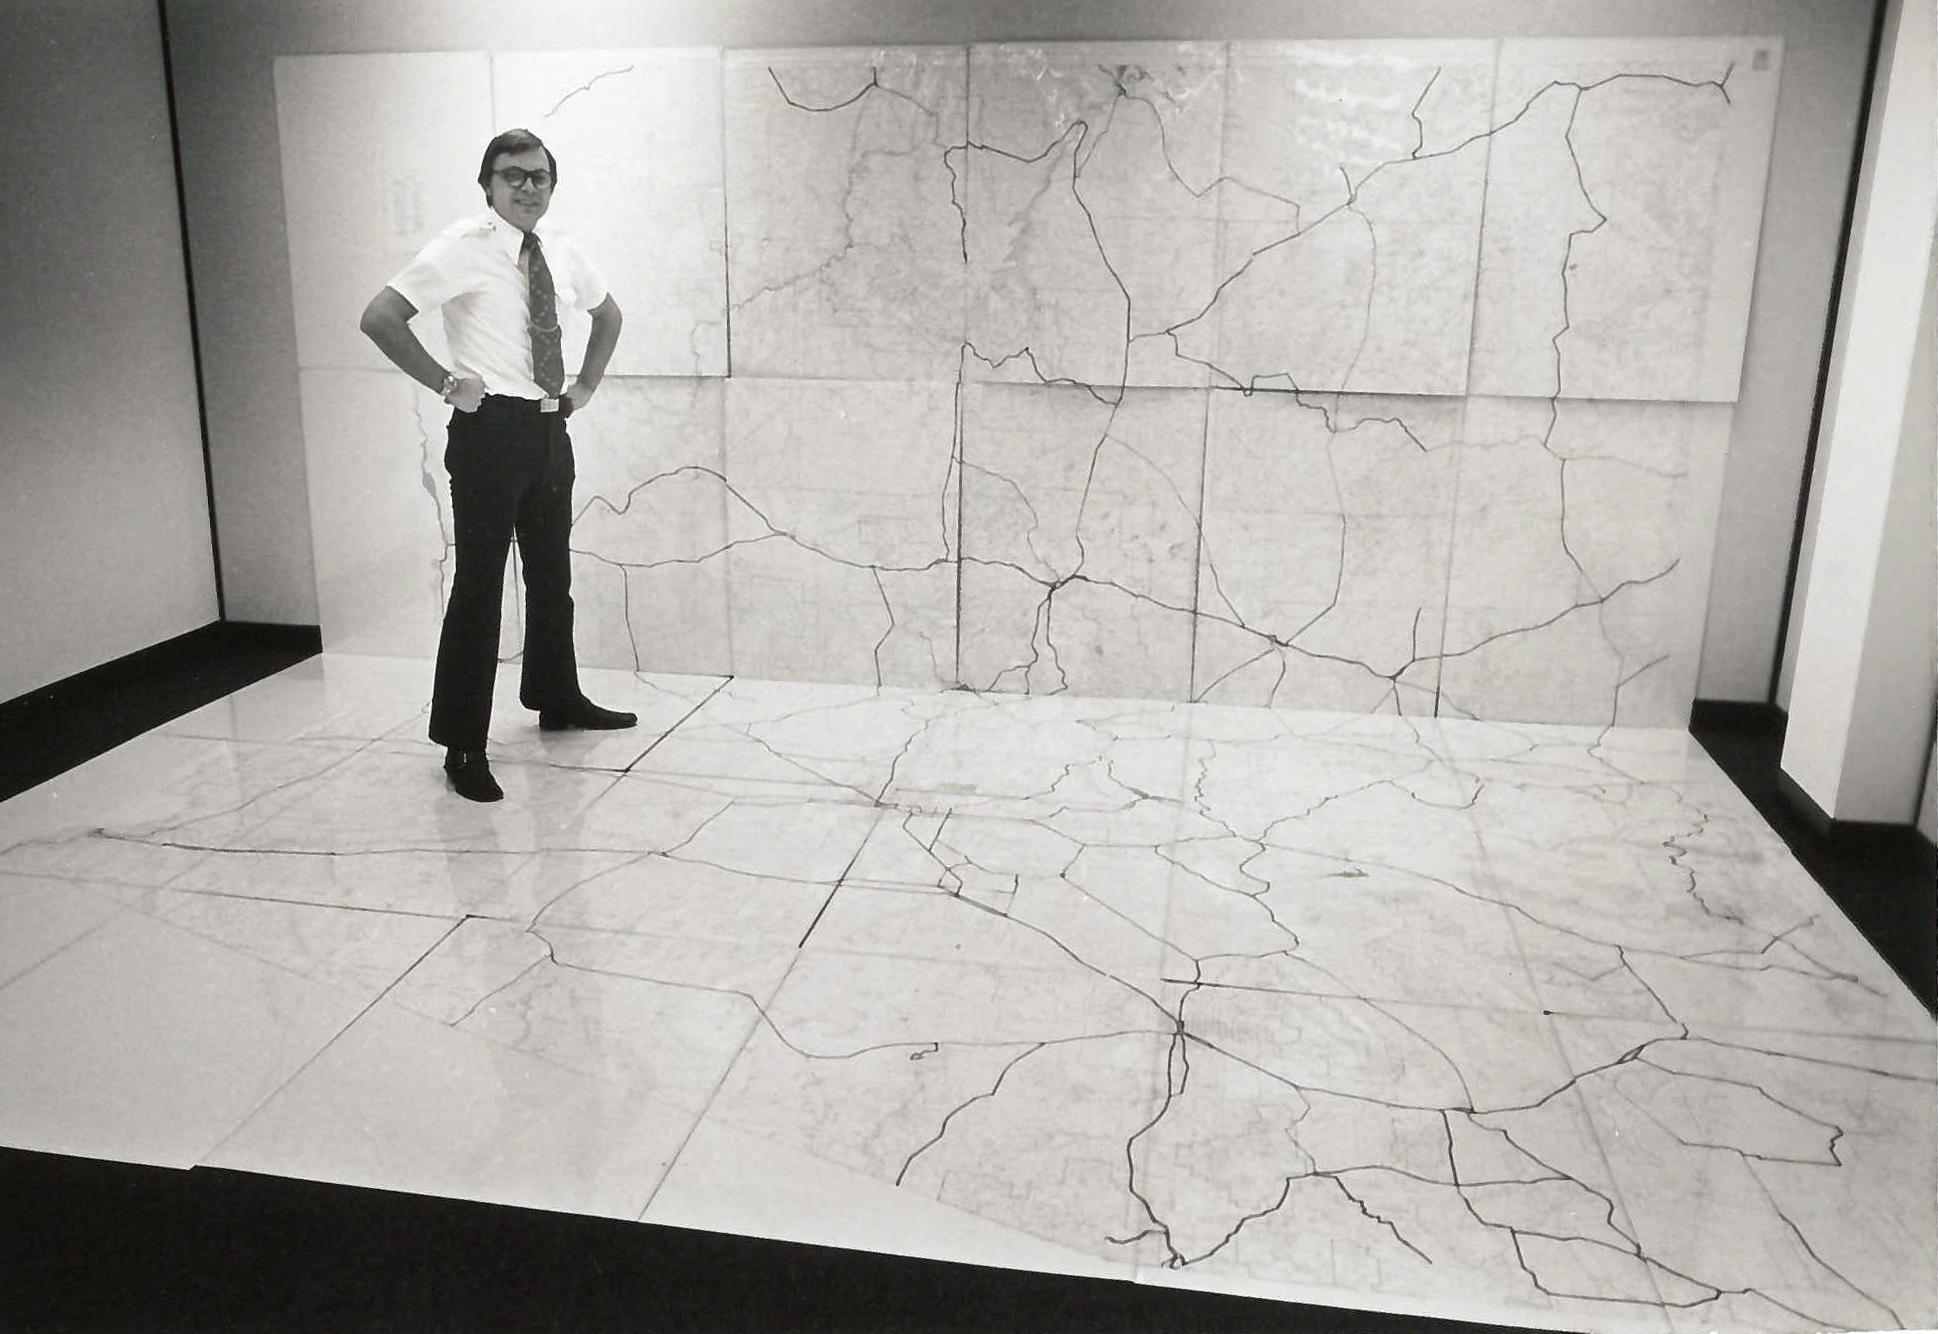 1970s cartography